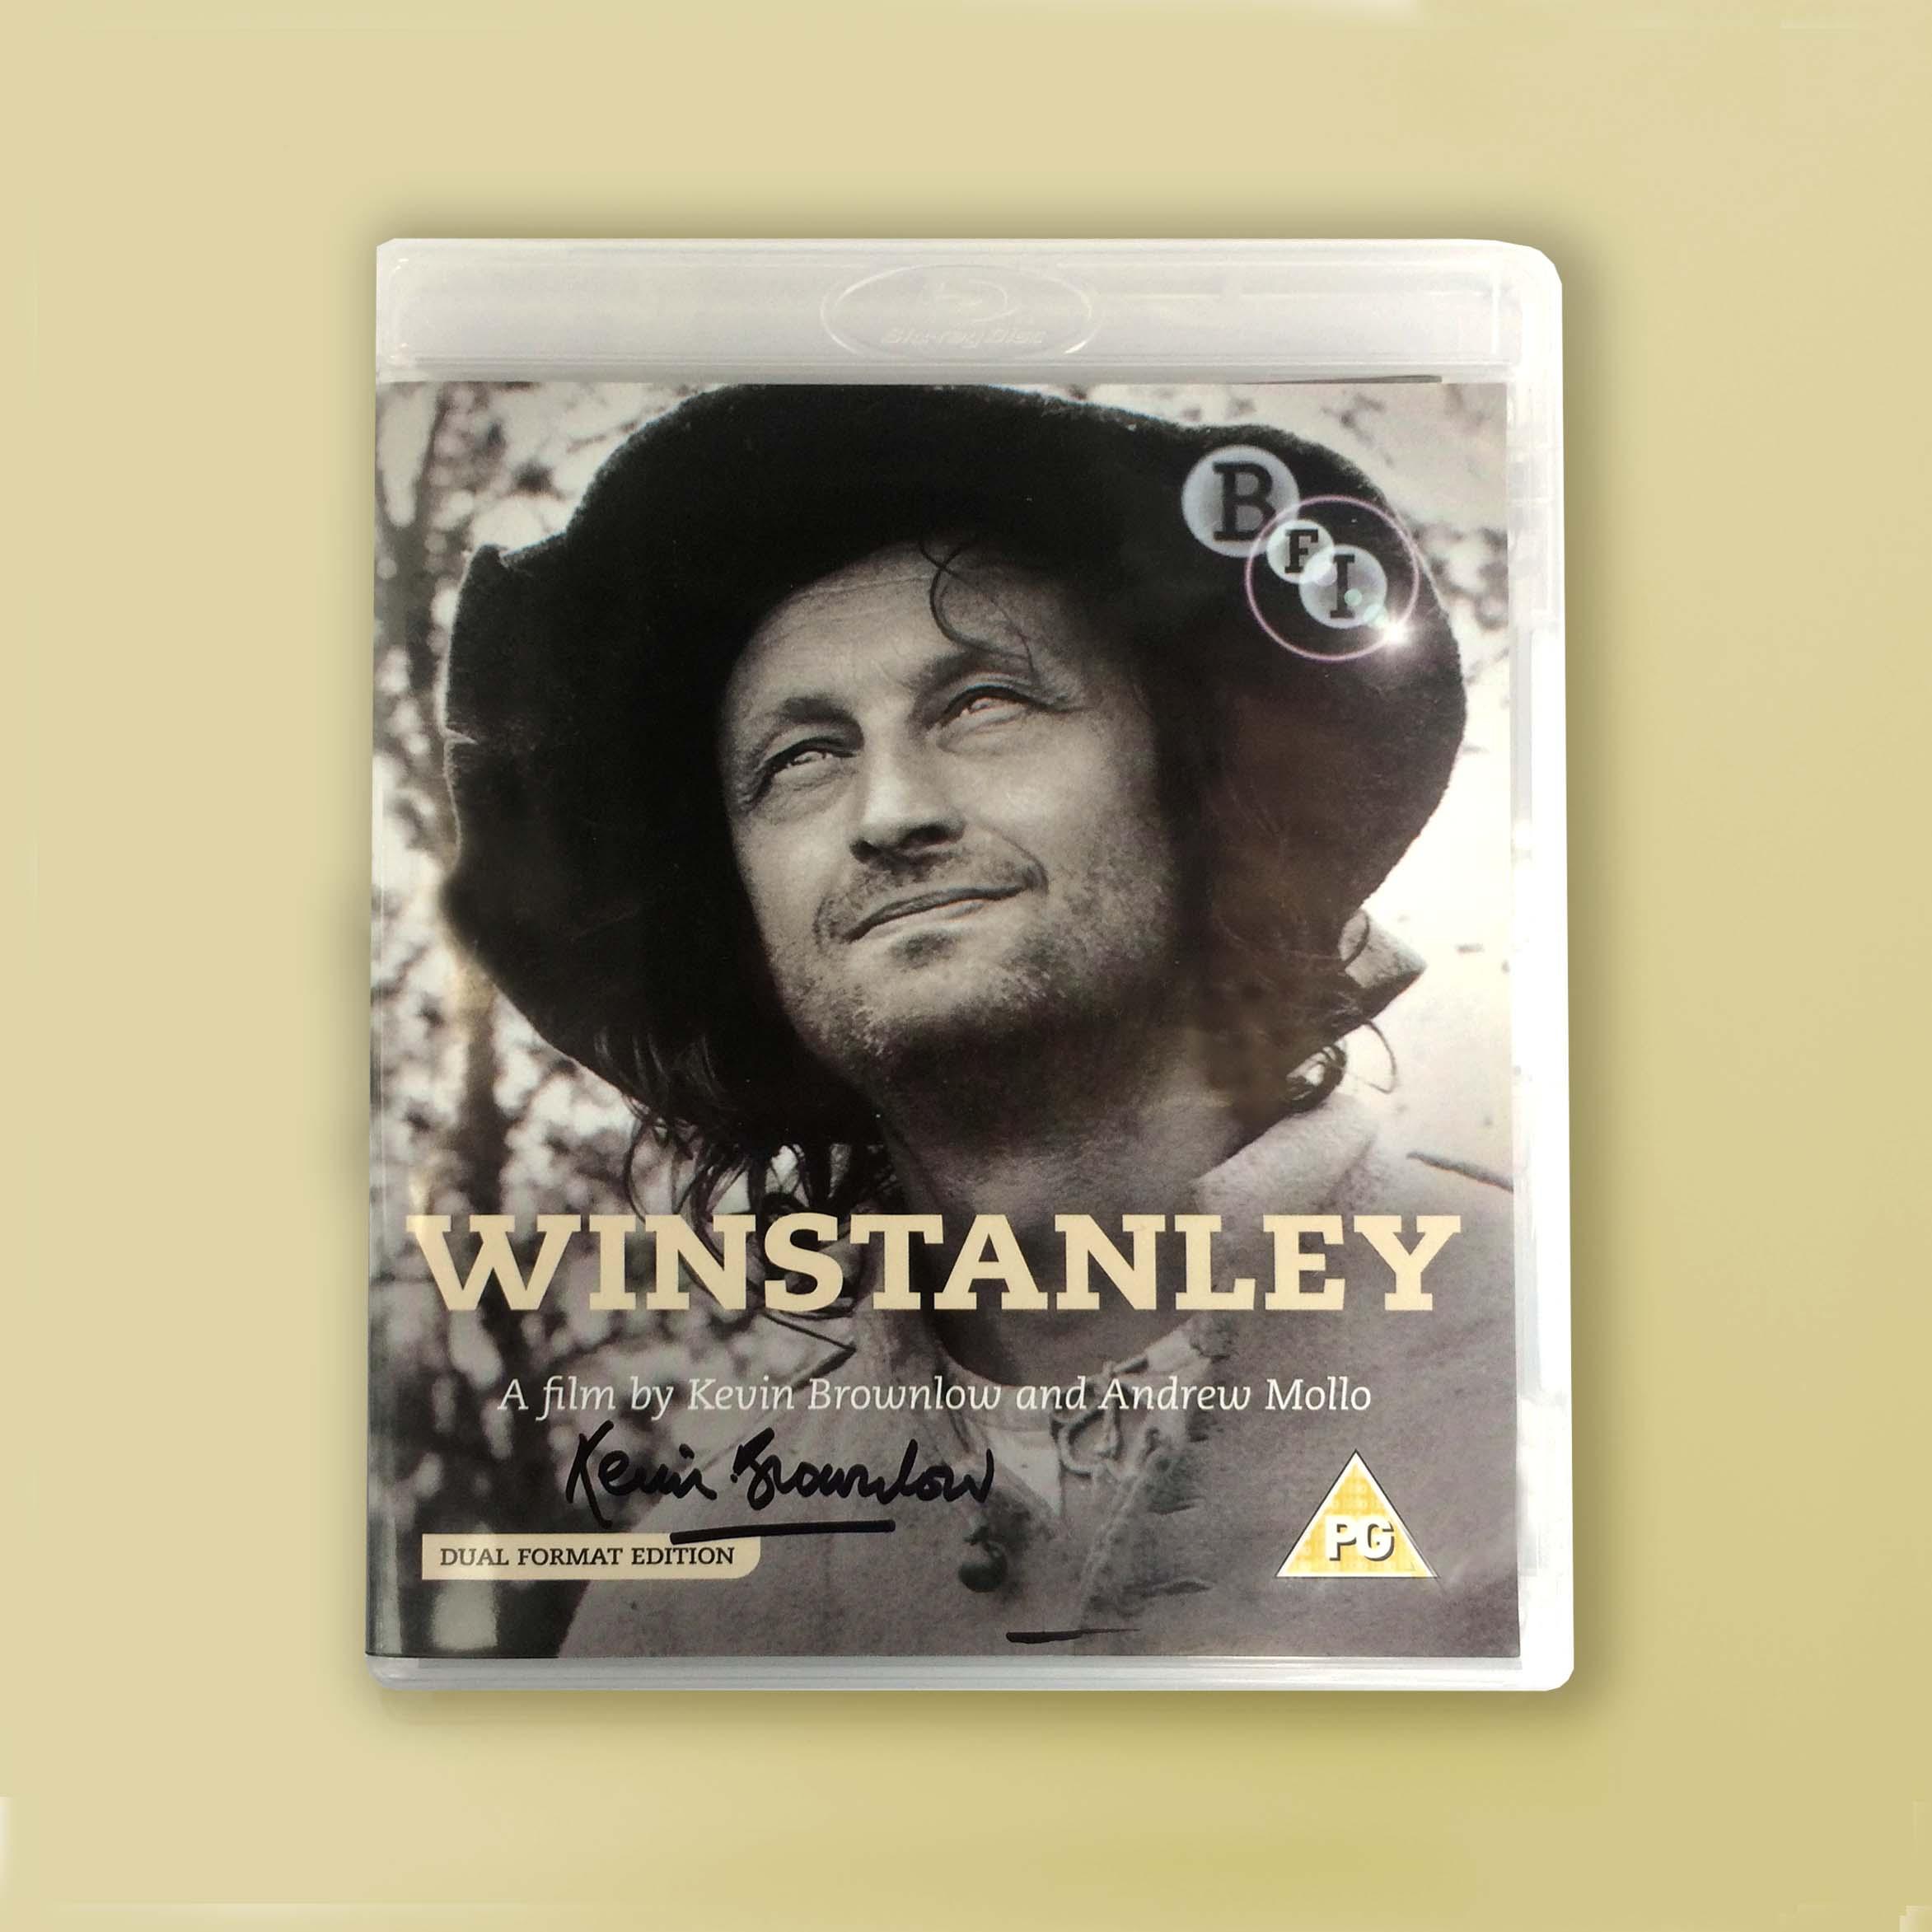 Buy Winstanley (SIGNED COPY) (Dual Format Edition)